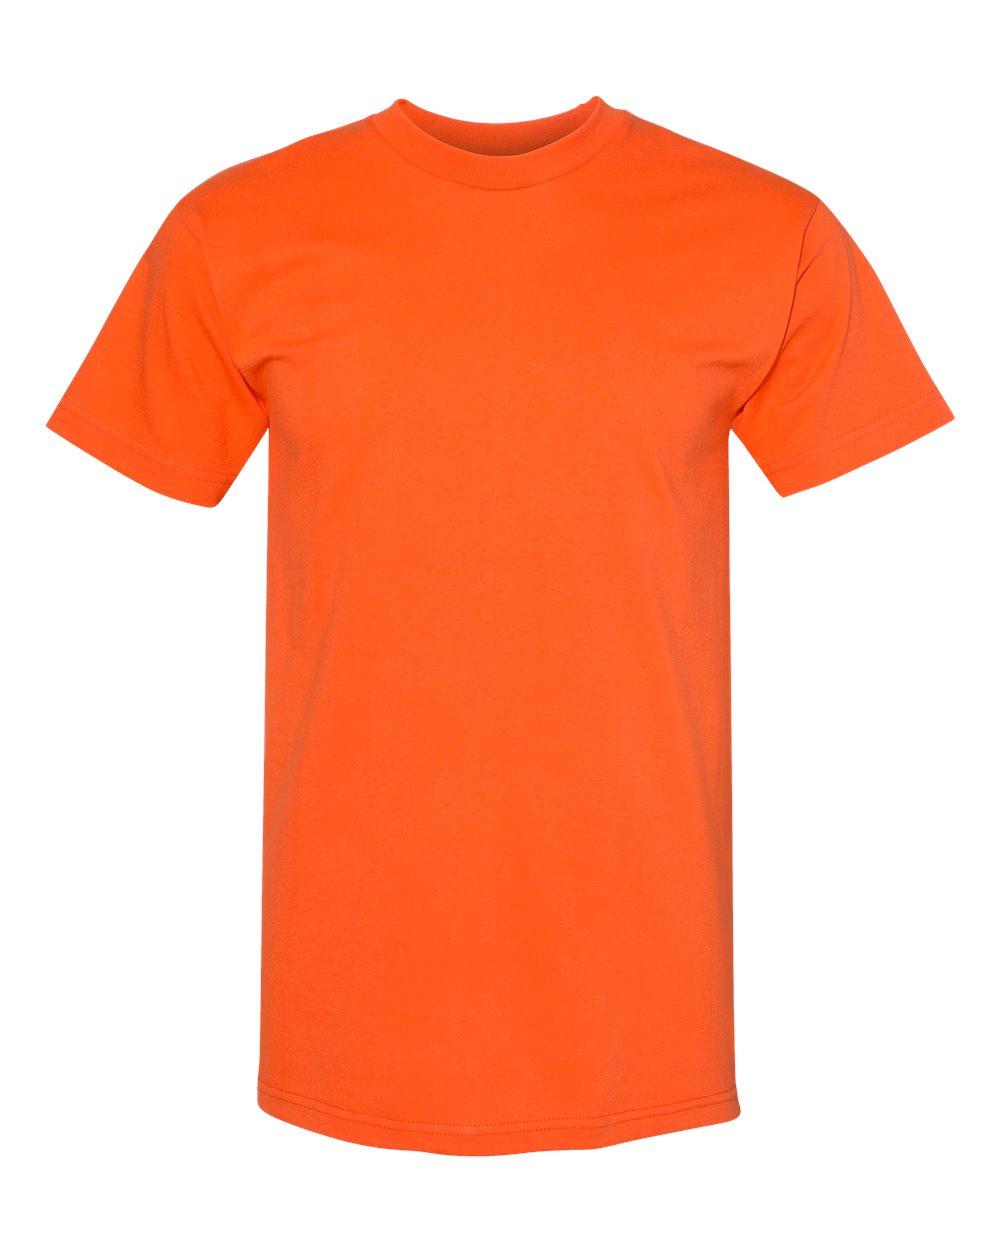 Bayside-Mens-Cotton-Blank-USA-Made-Short-Sleeve-T-Shirt-5100-up-to-5XL thumbnail 30